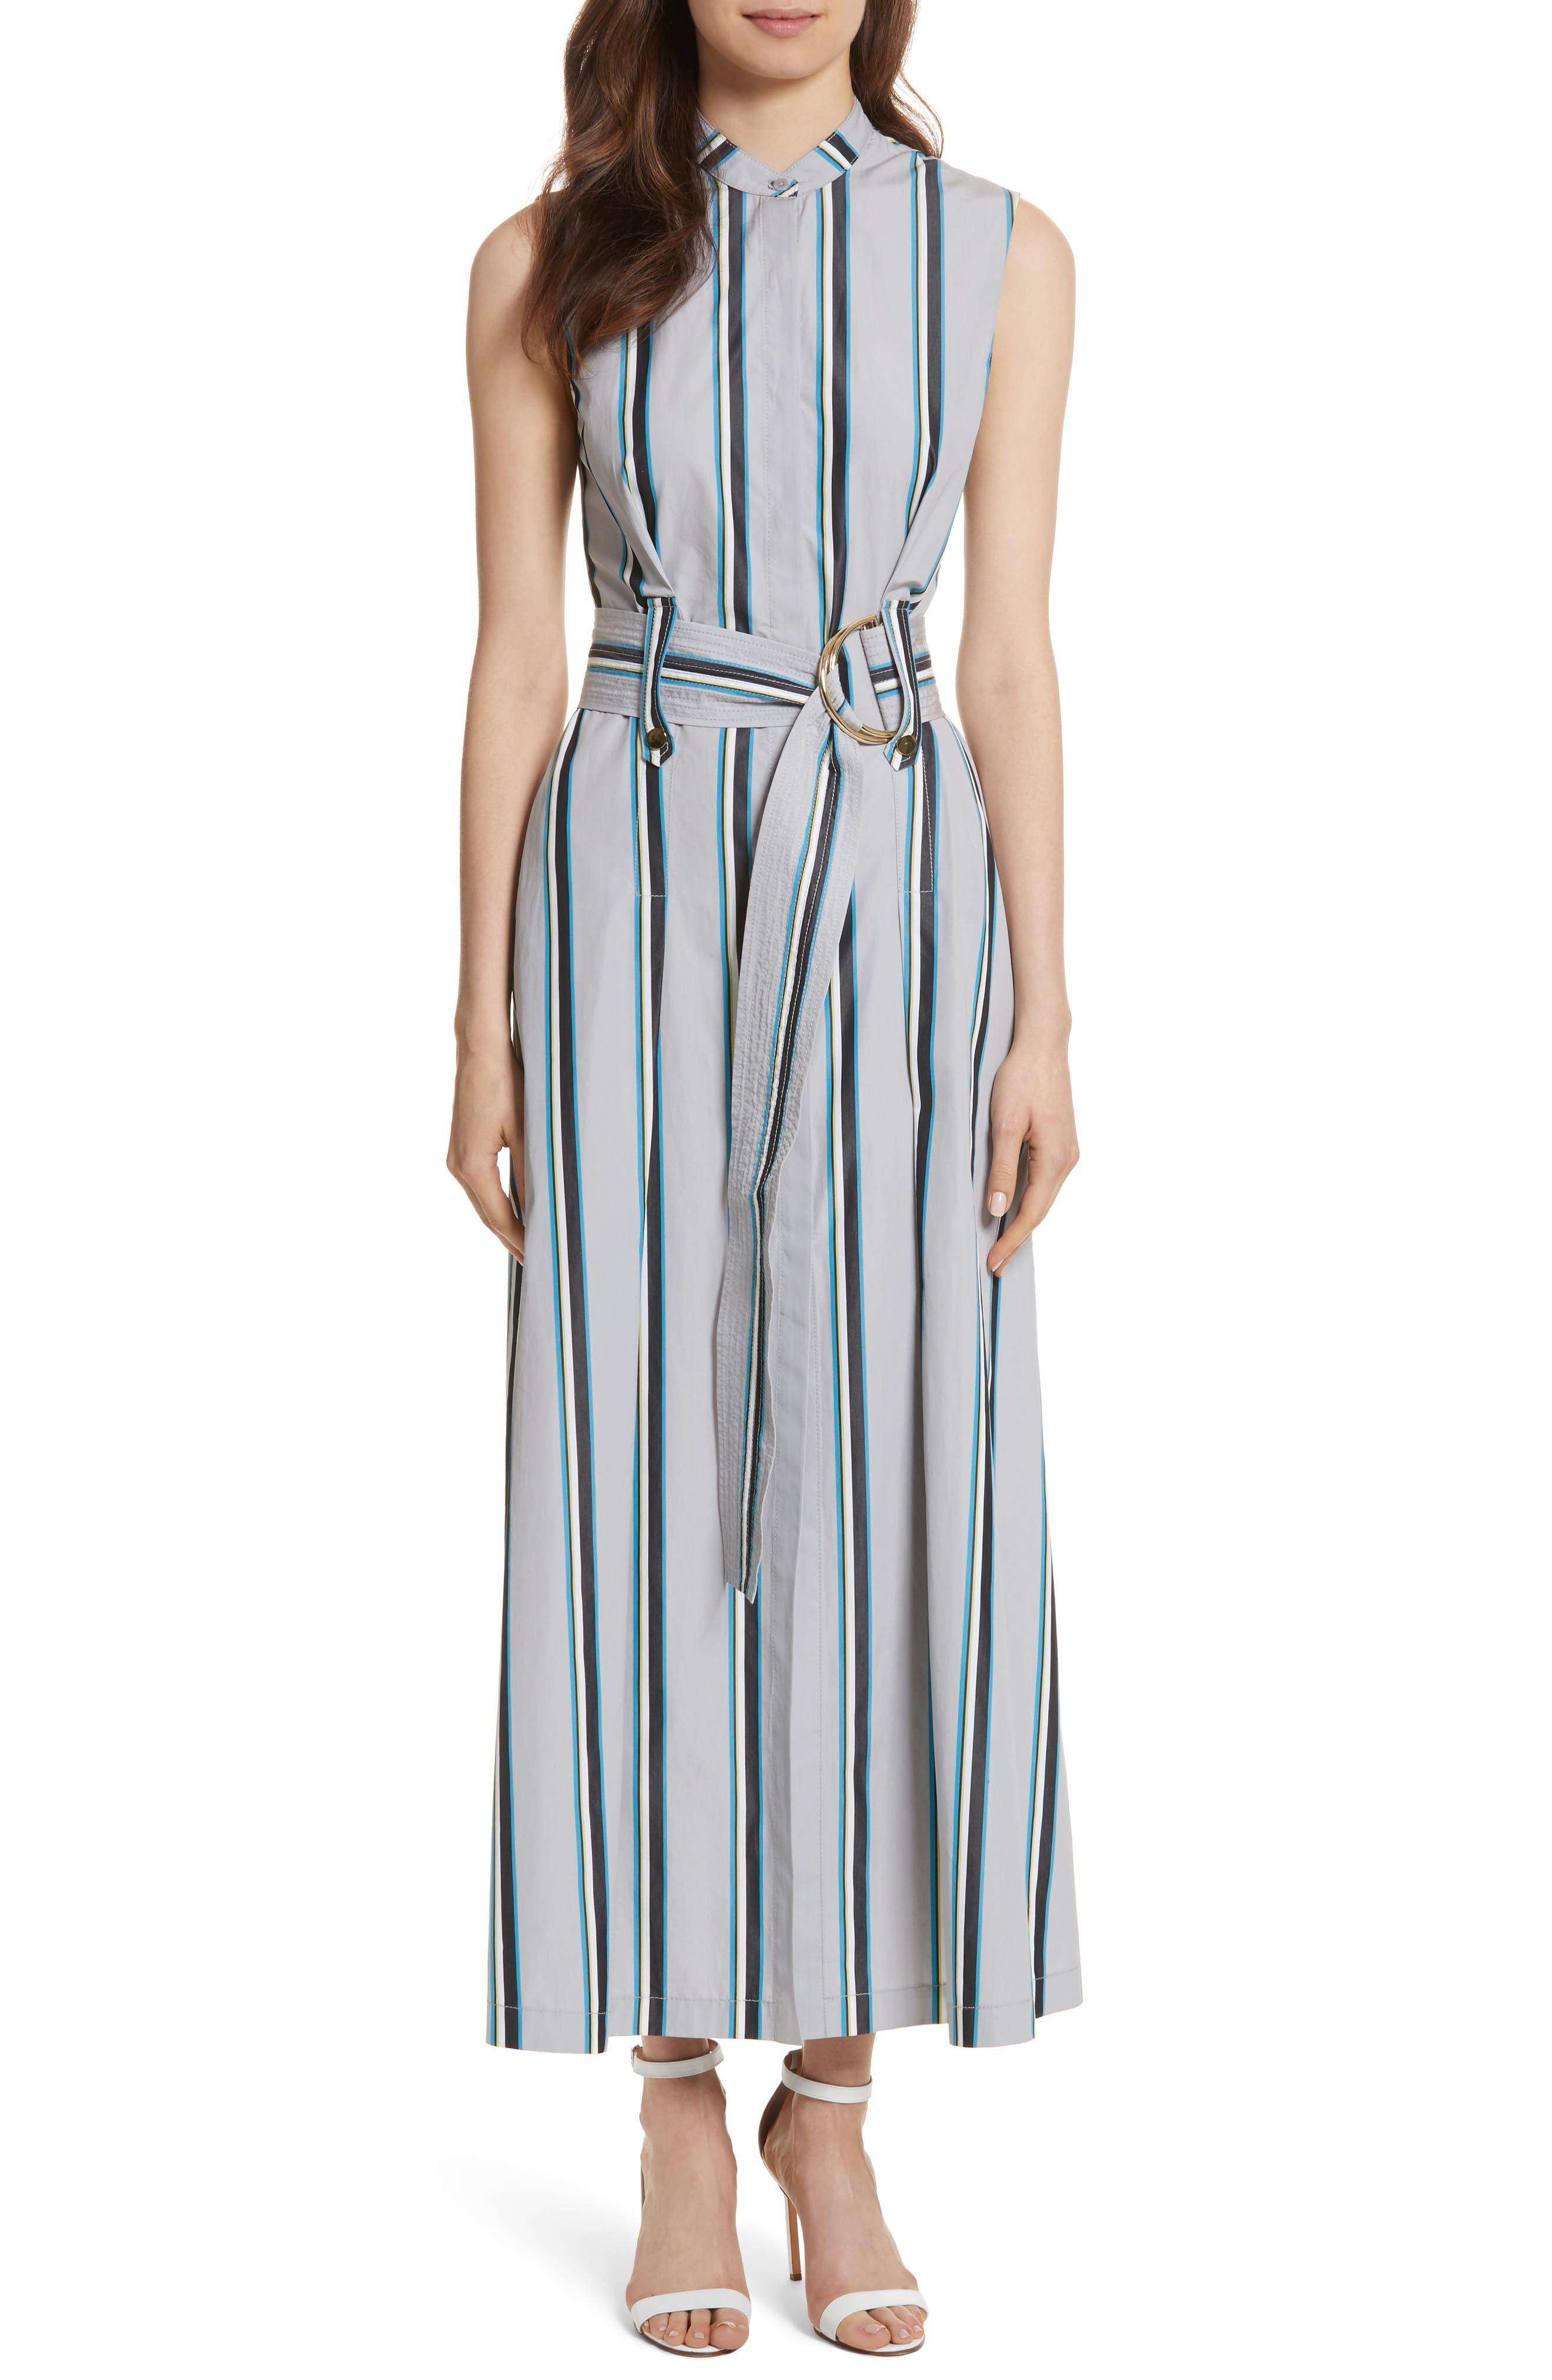 Diane von Furstenberg Stripe Belted Maxi Dress,                             Main thumbnail 1, color,                             Smoke Multi